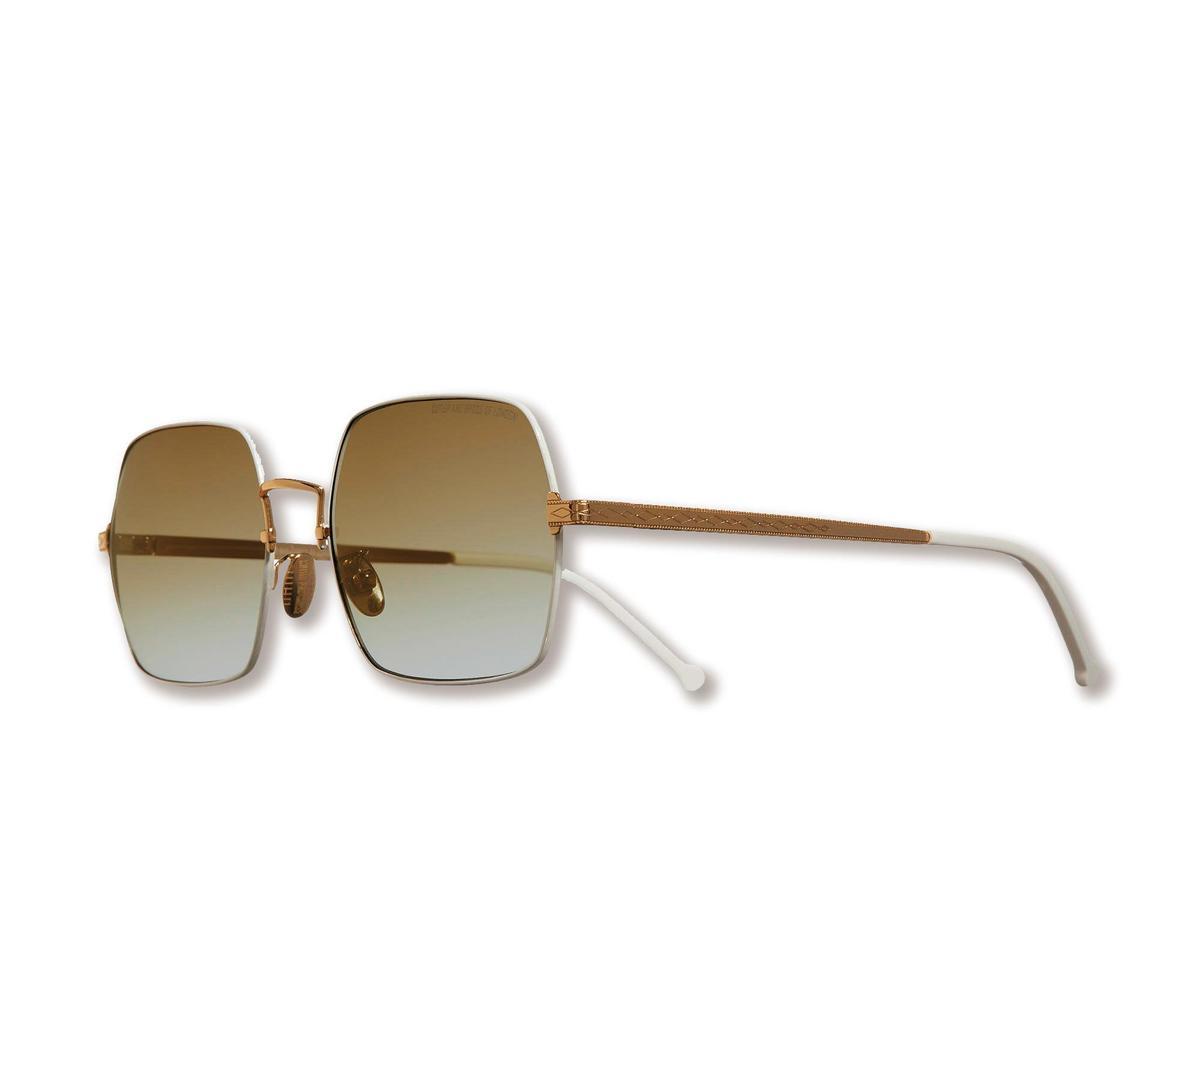 CUTLER & GROSS棕色鏡片方框太陽眼鏡。NT$16,000